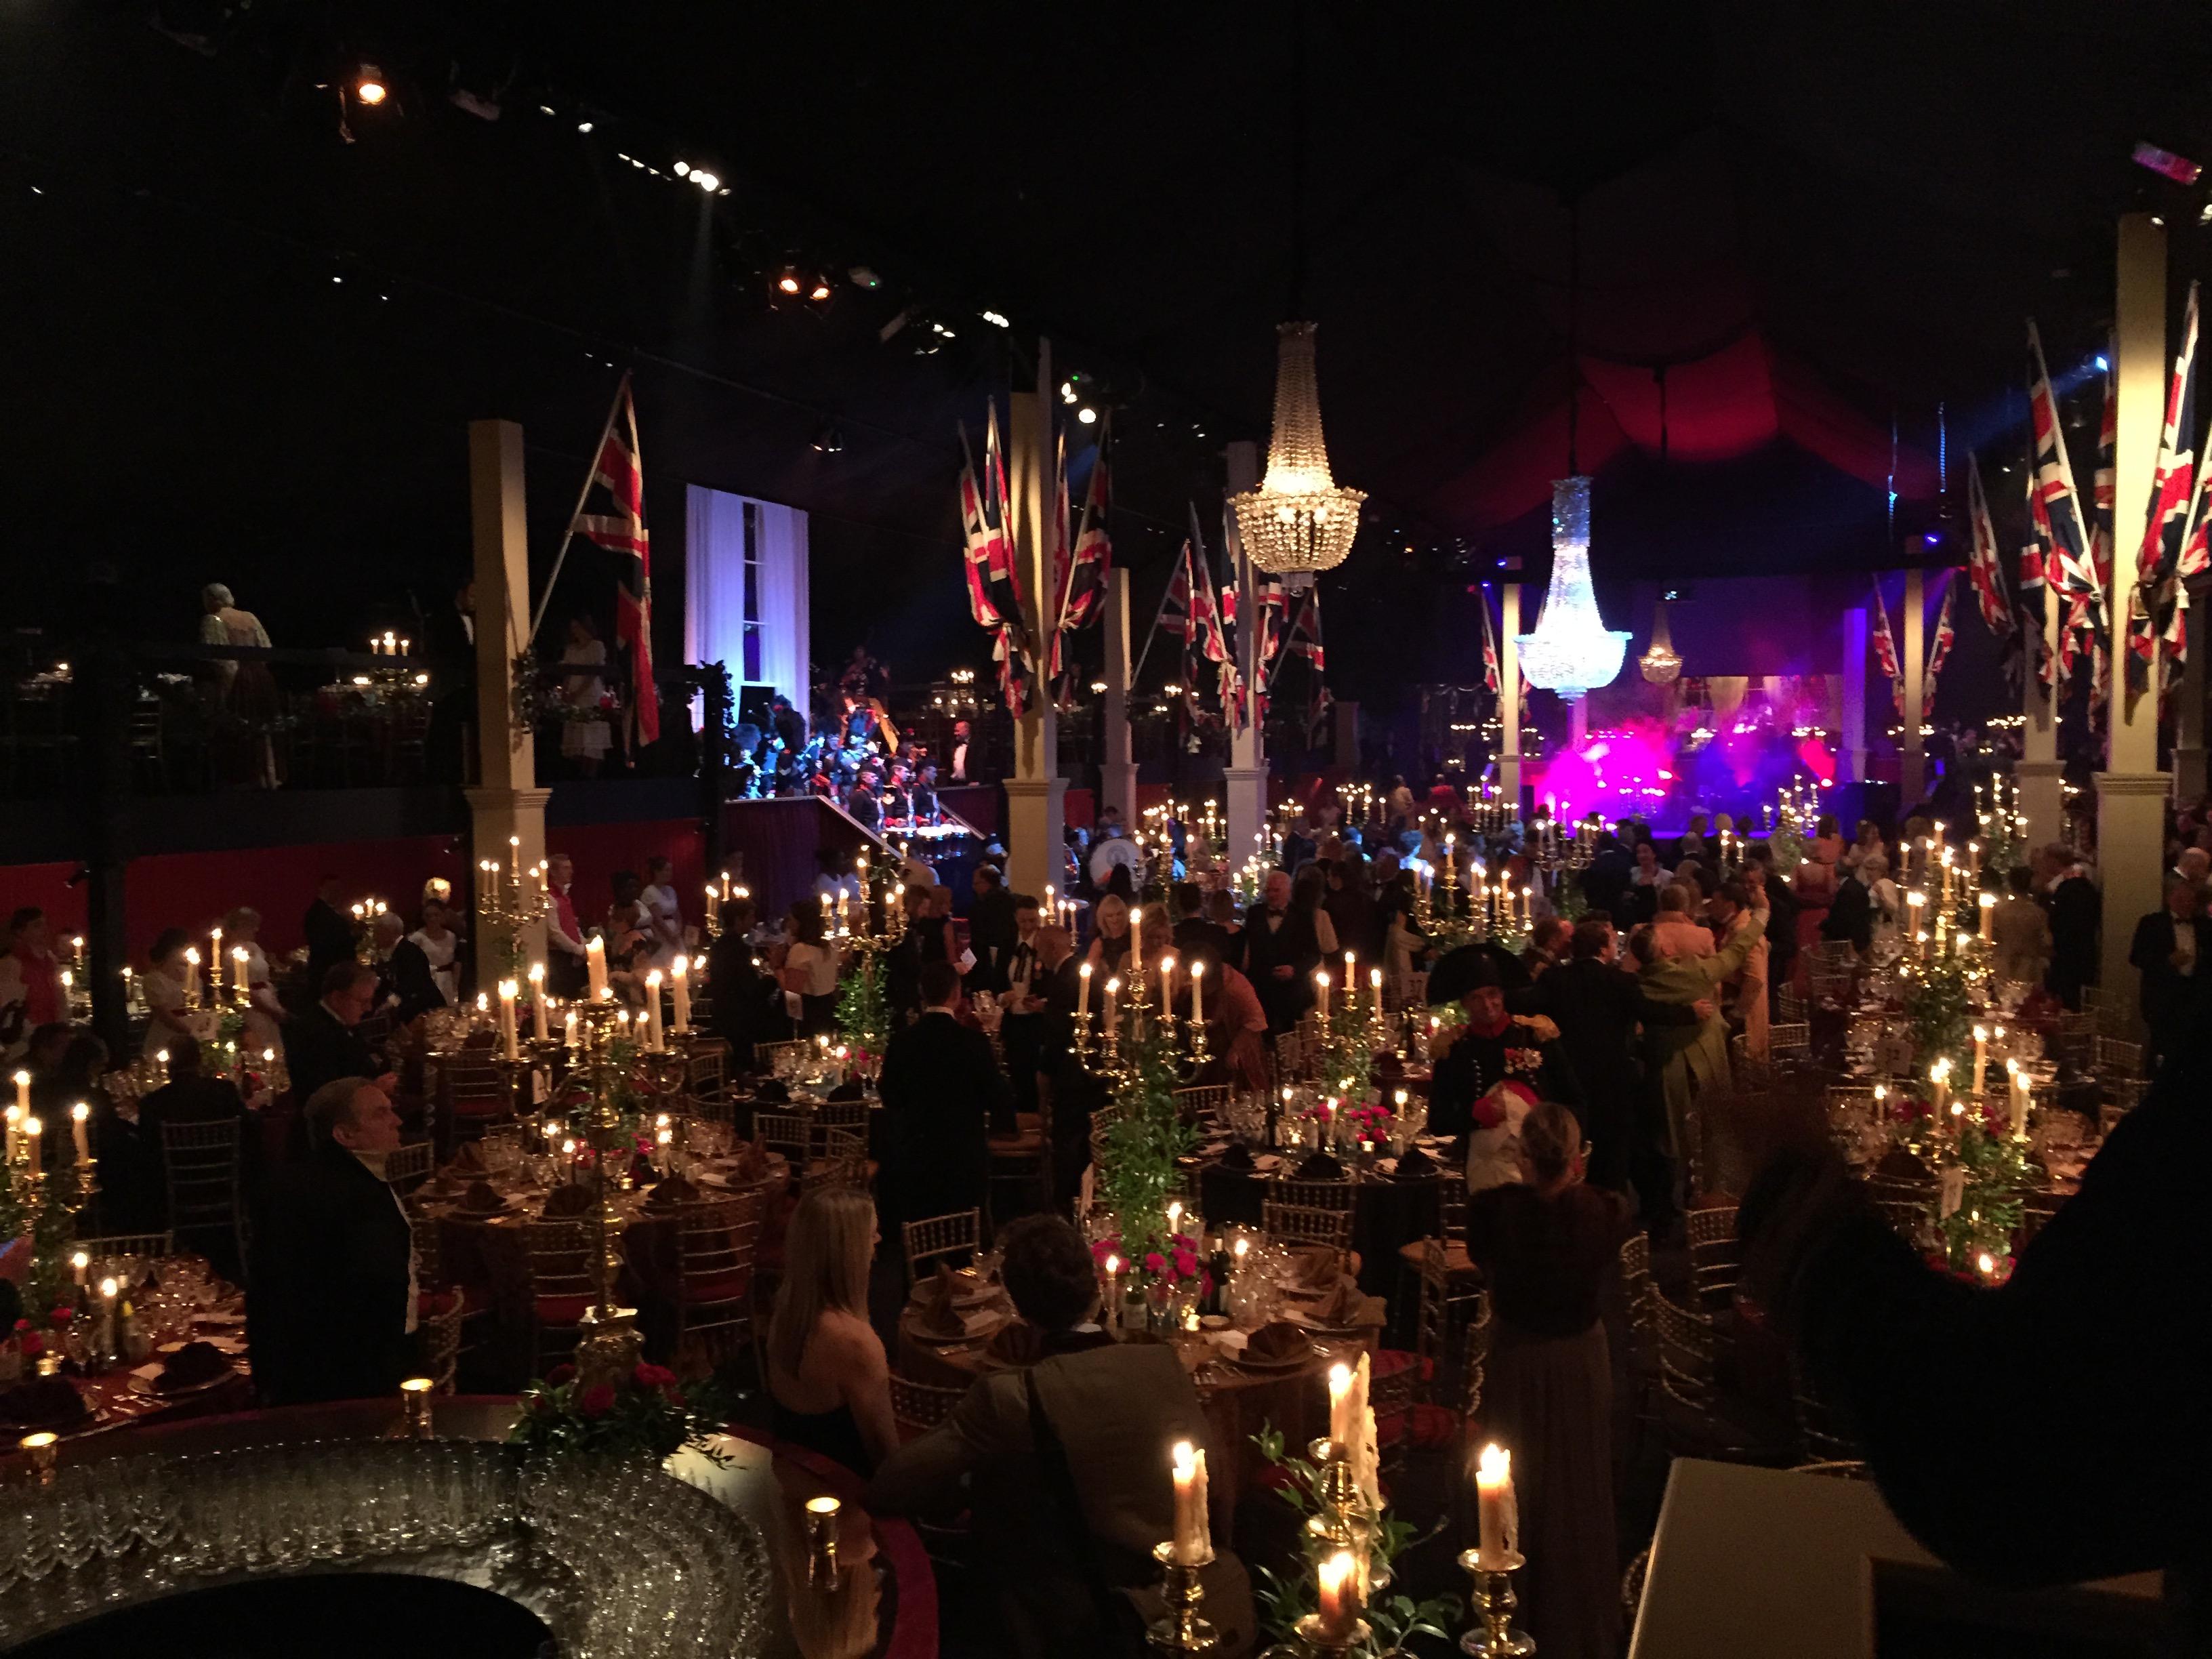 Event Decor London Goodwood Revival Ball The Battle Of Waterloo London Spicedfox